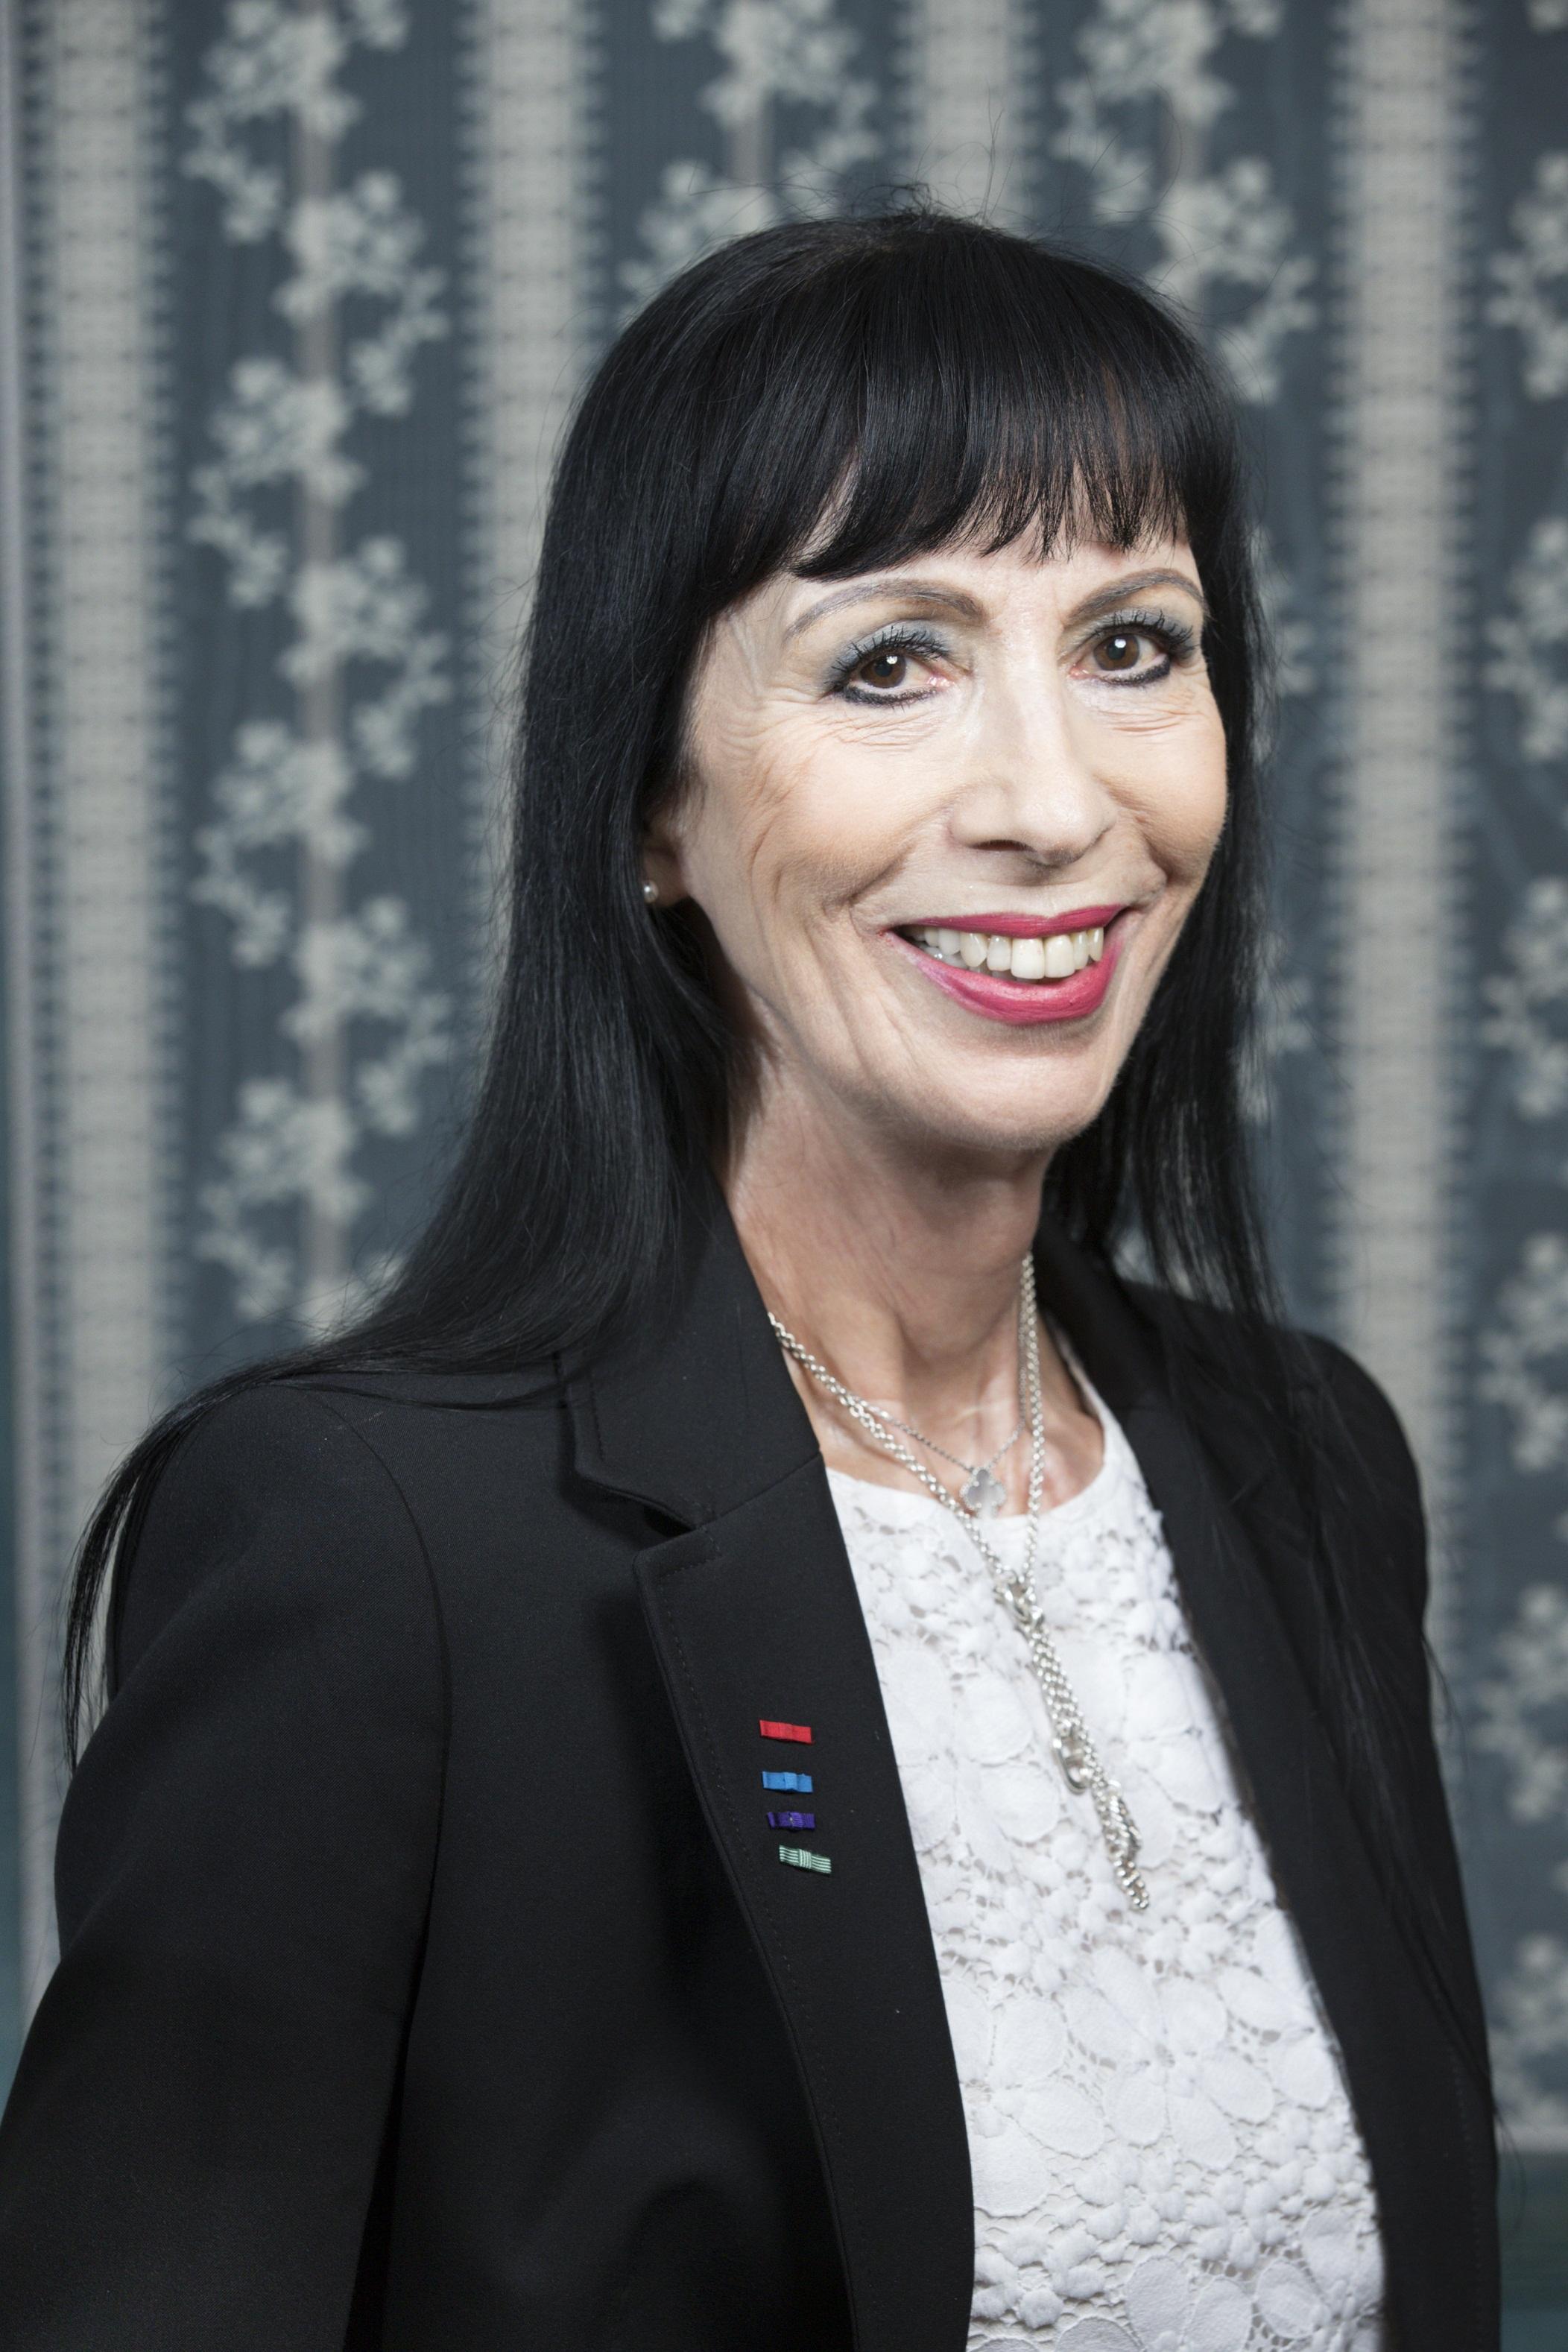 Natalie Fricero